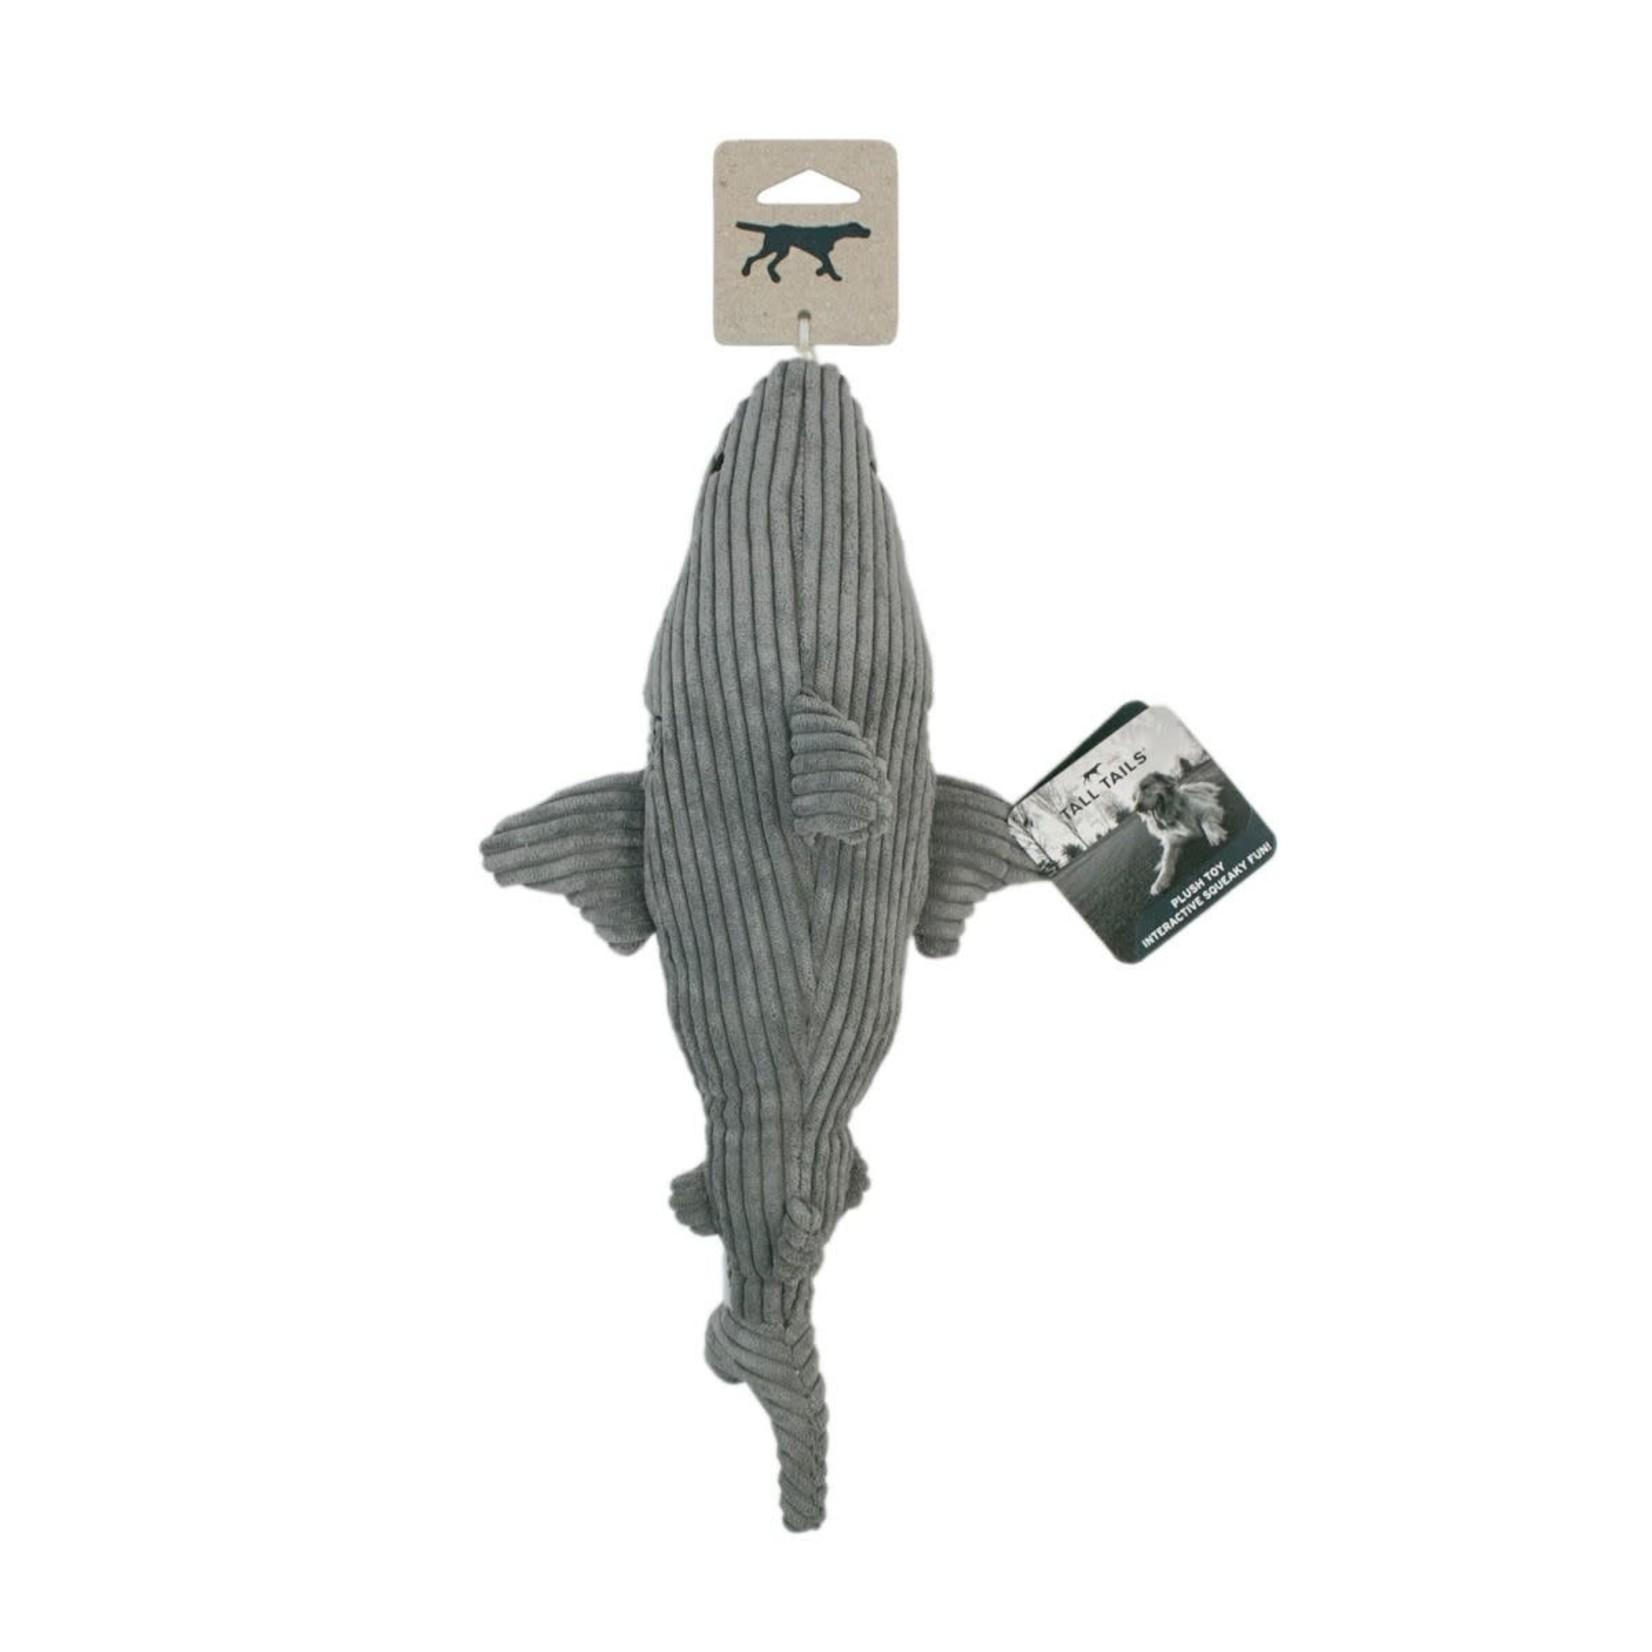 Tall Tails Tall Tails Plush Squeaker Crunch Shark